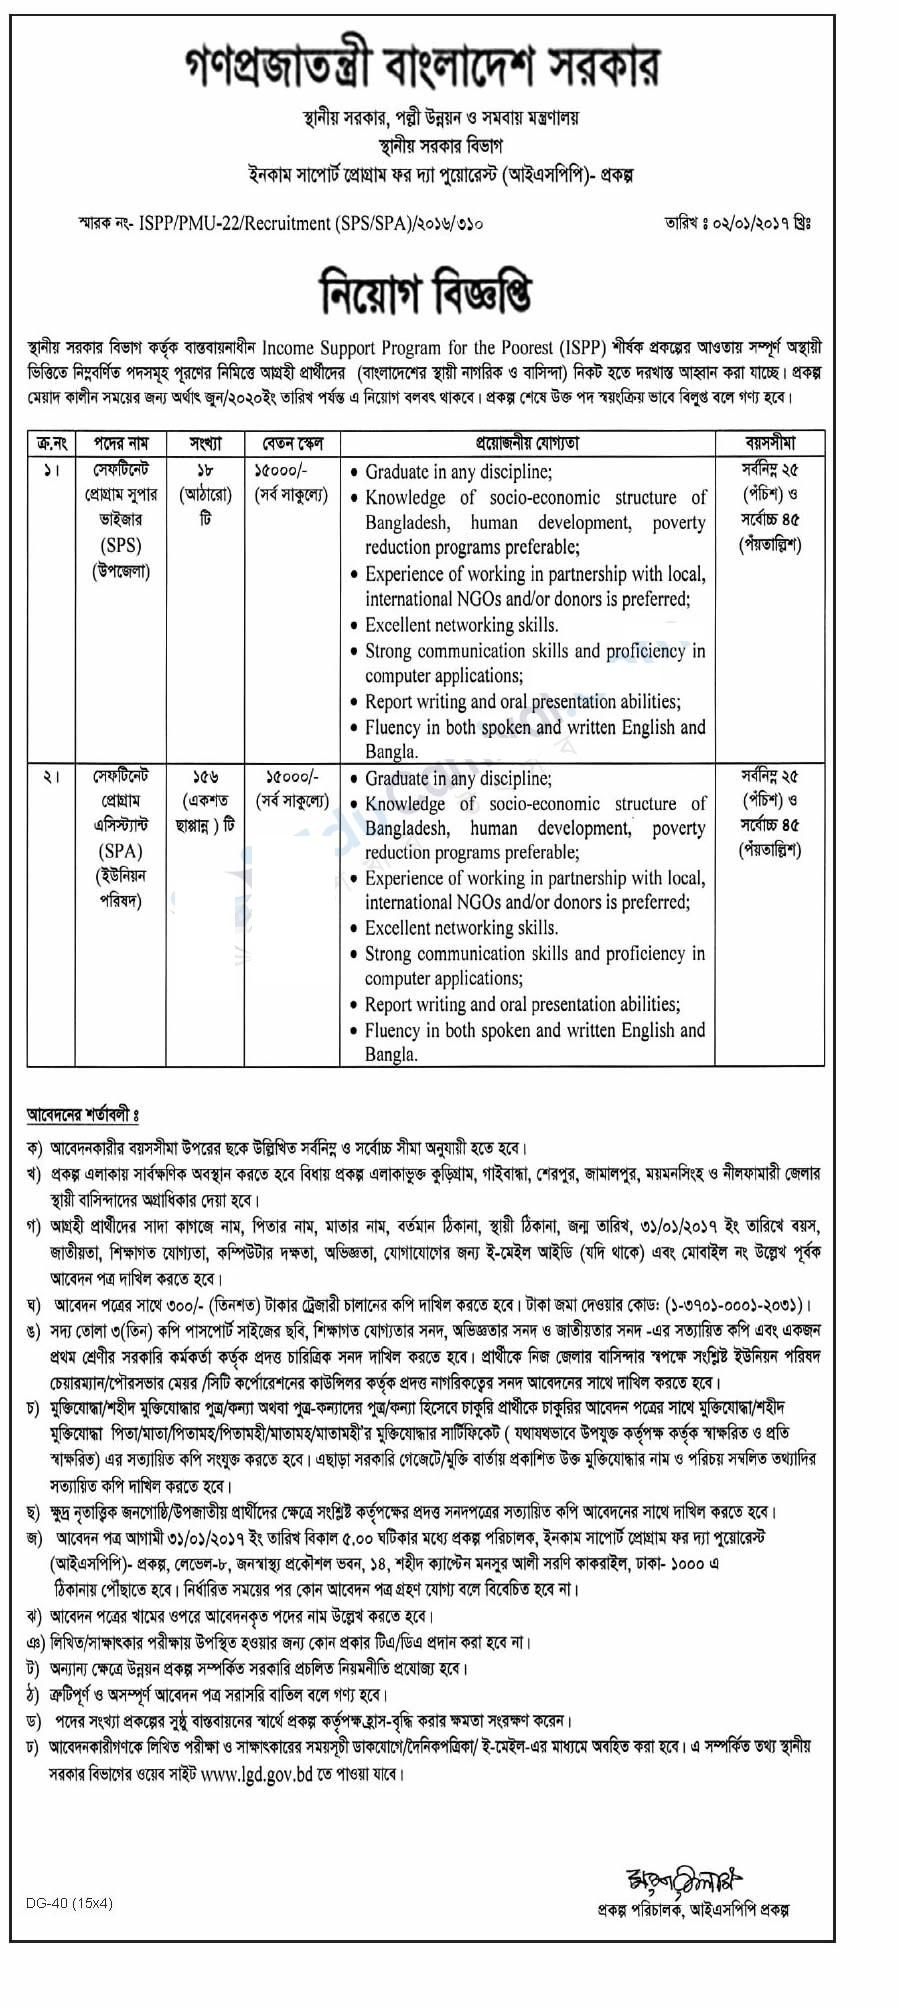 Department of Local Government Division (LGD) Job Circular January 2017